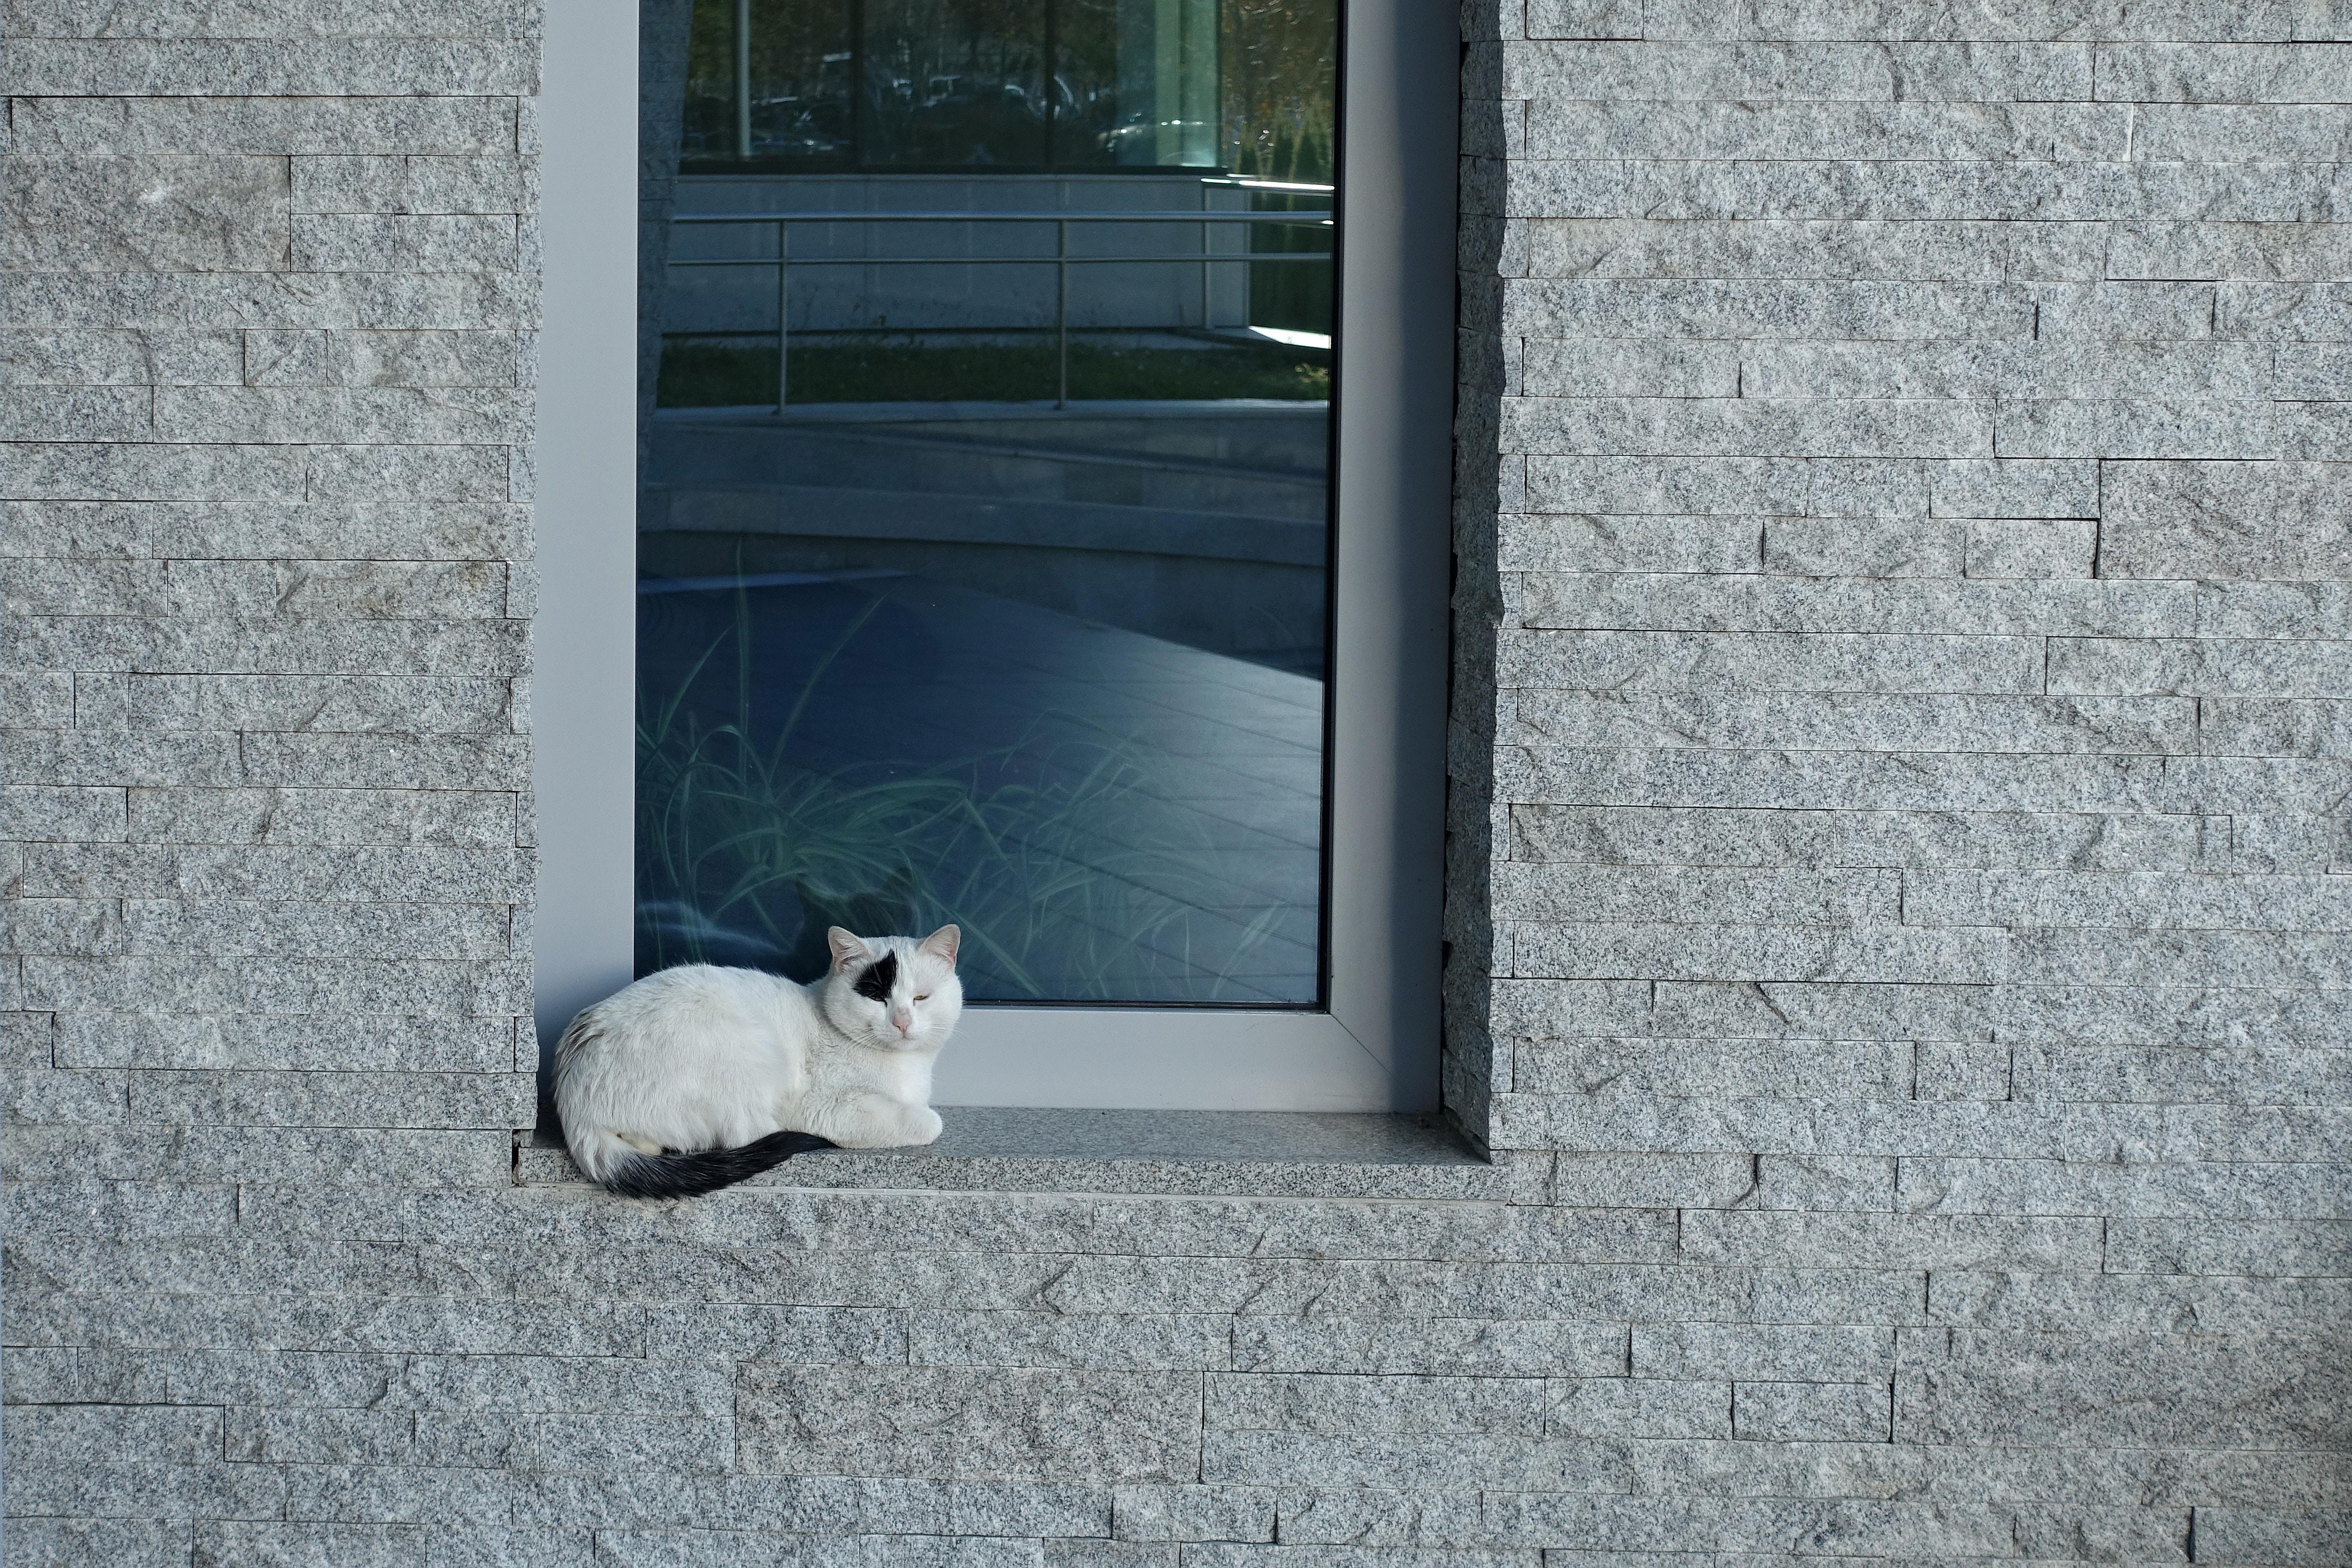 white cat sitting beside glass window